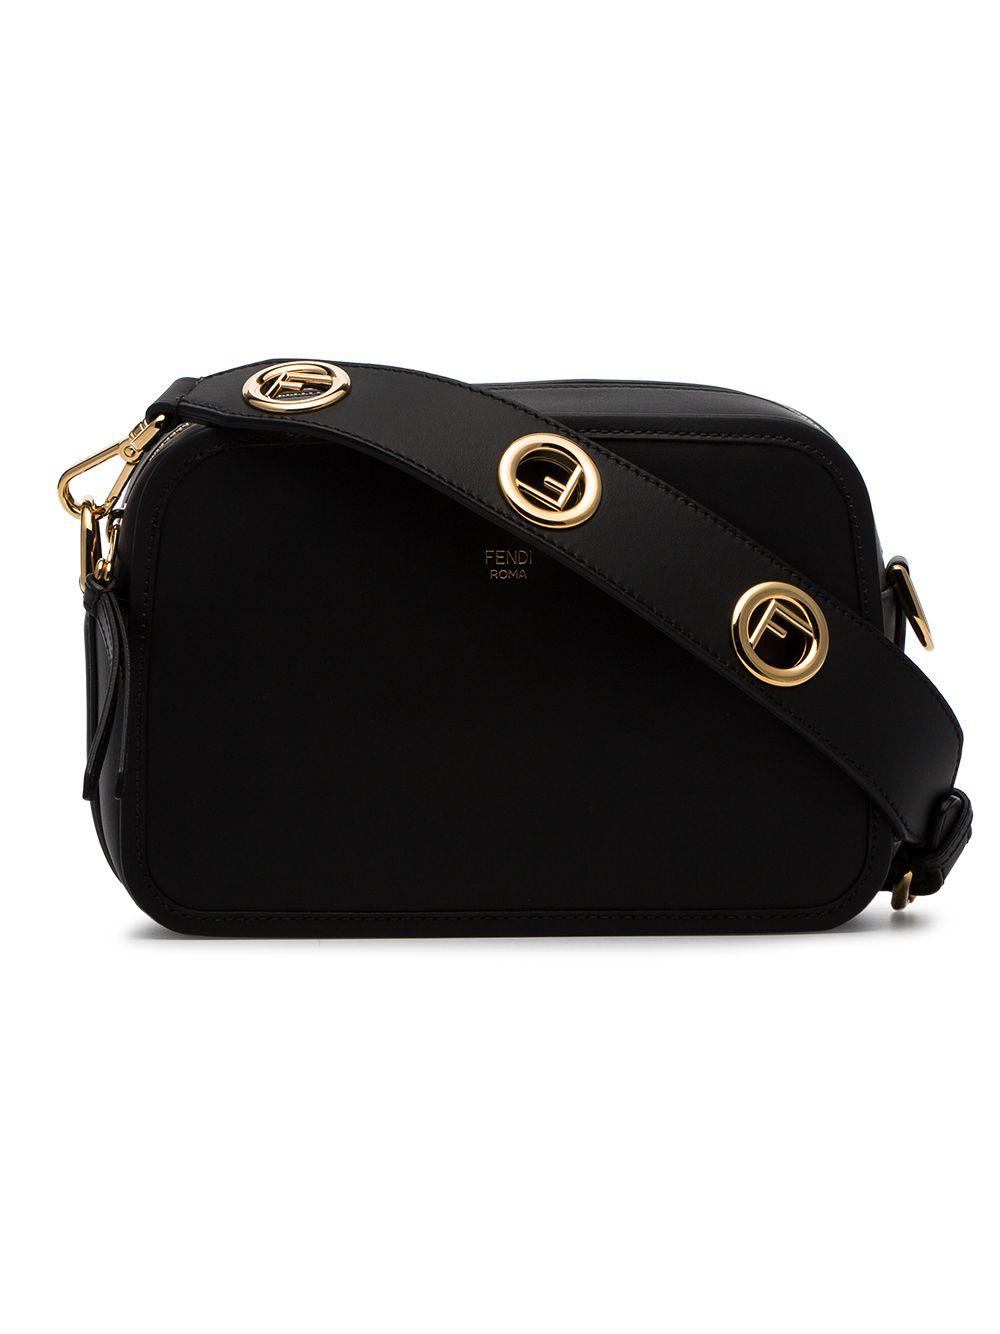 1c4ef3628052 Fendi Black Camera Leather Crossbody Bag